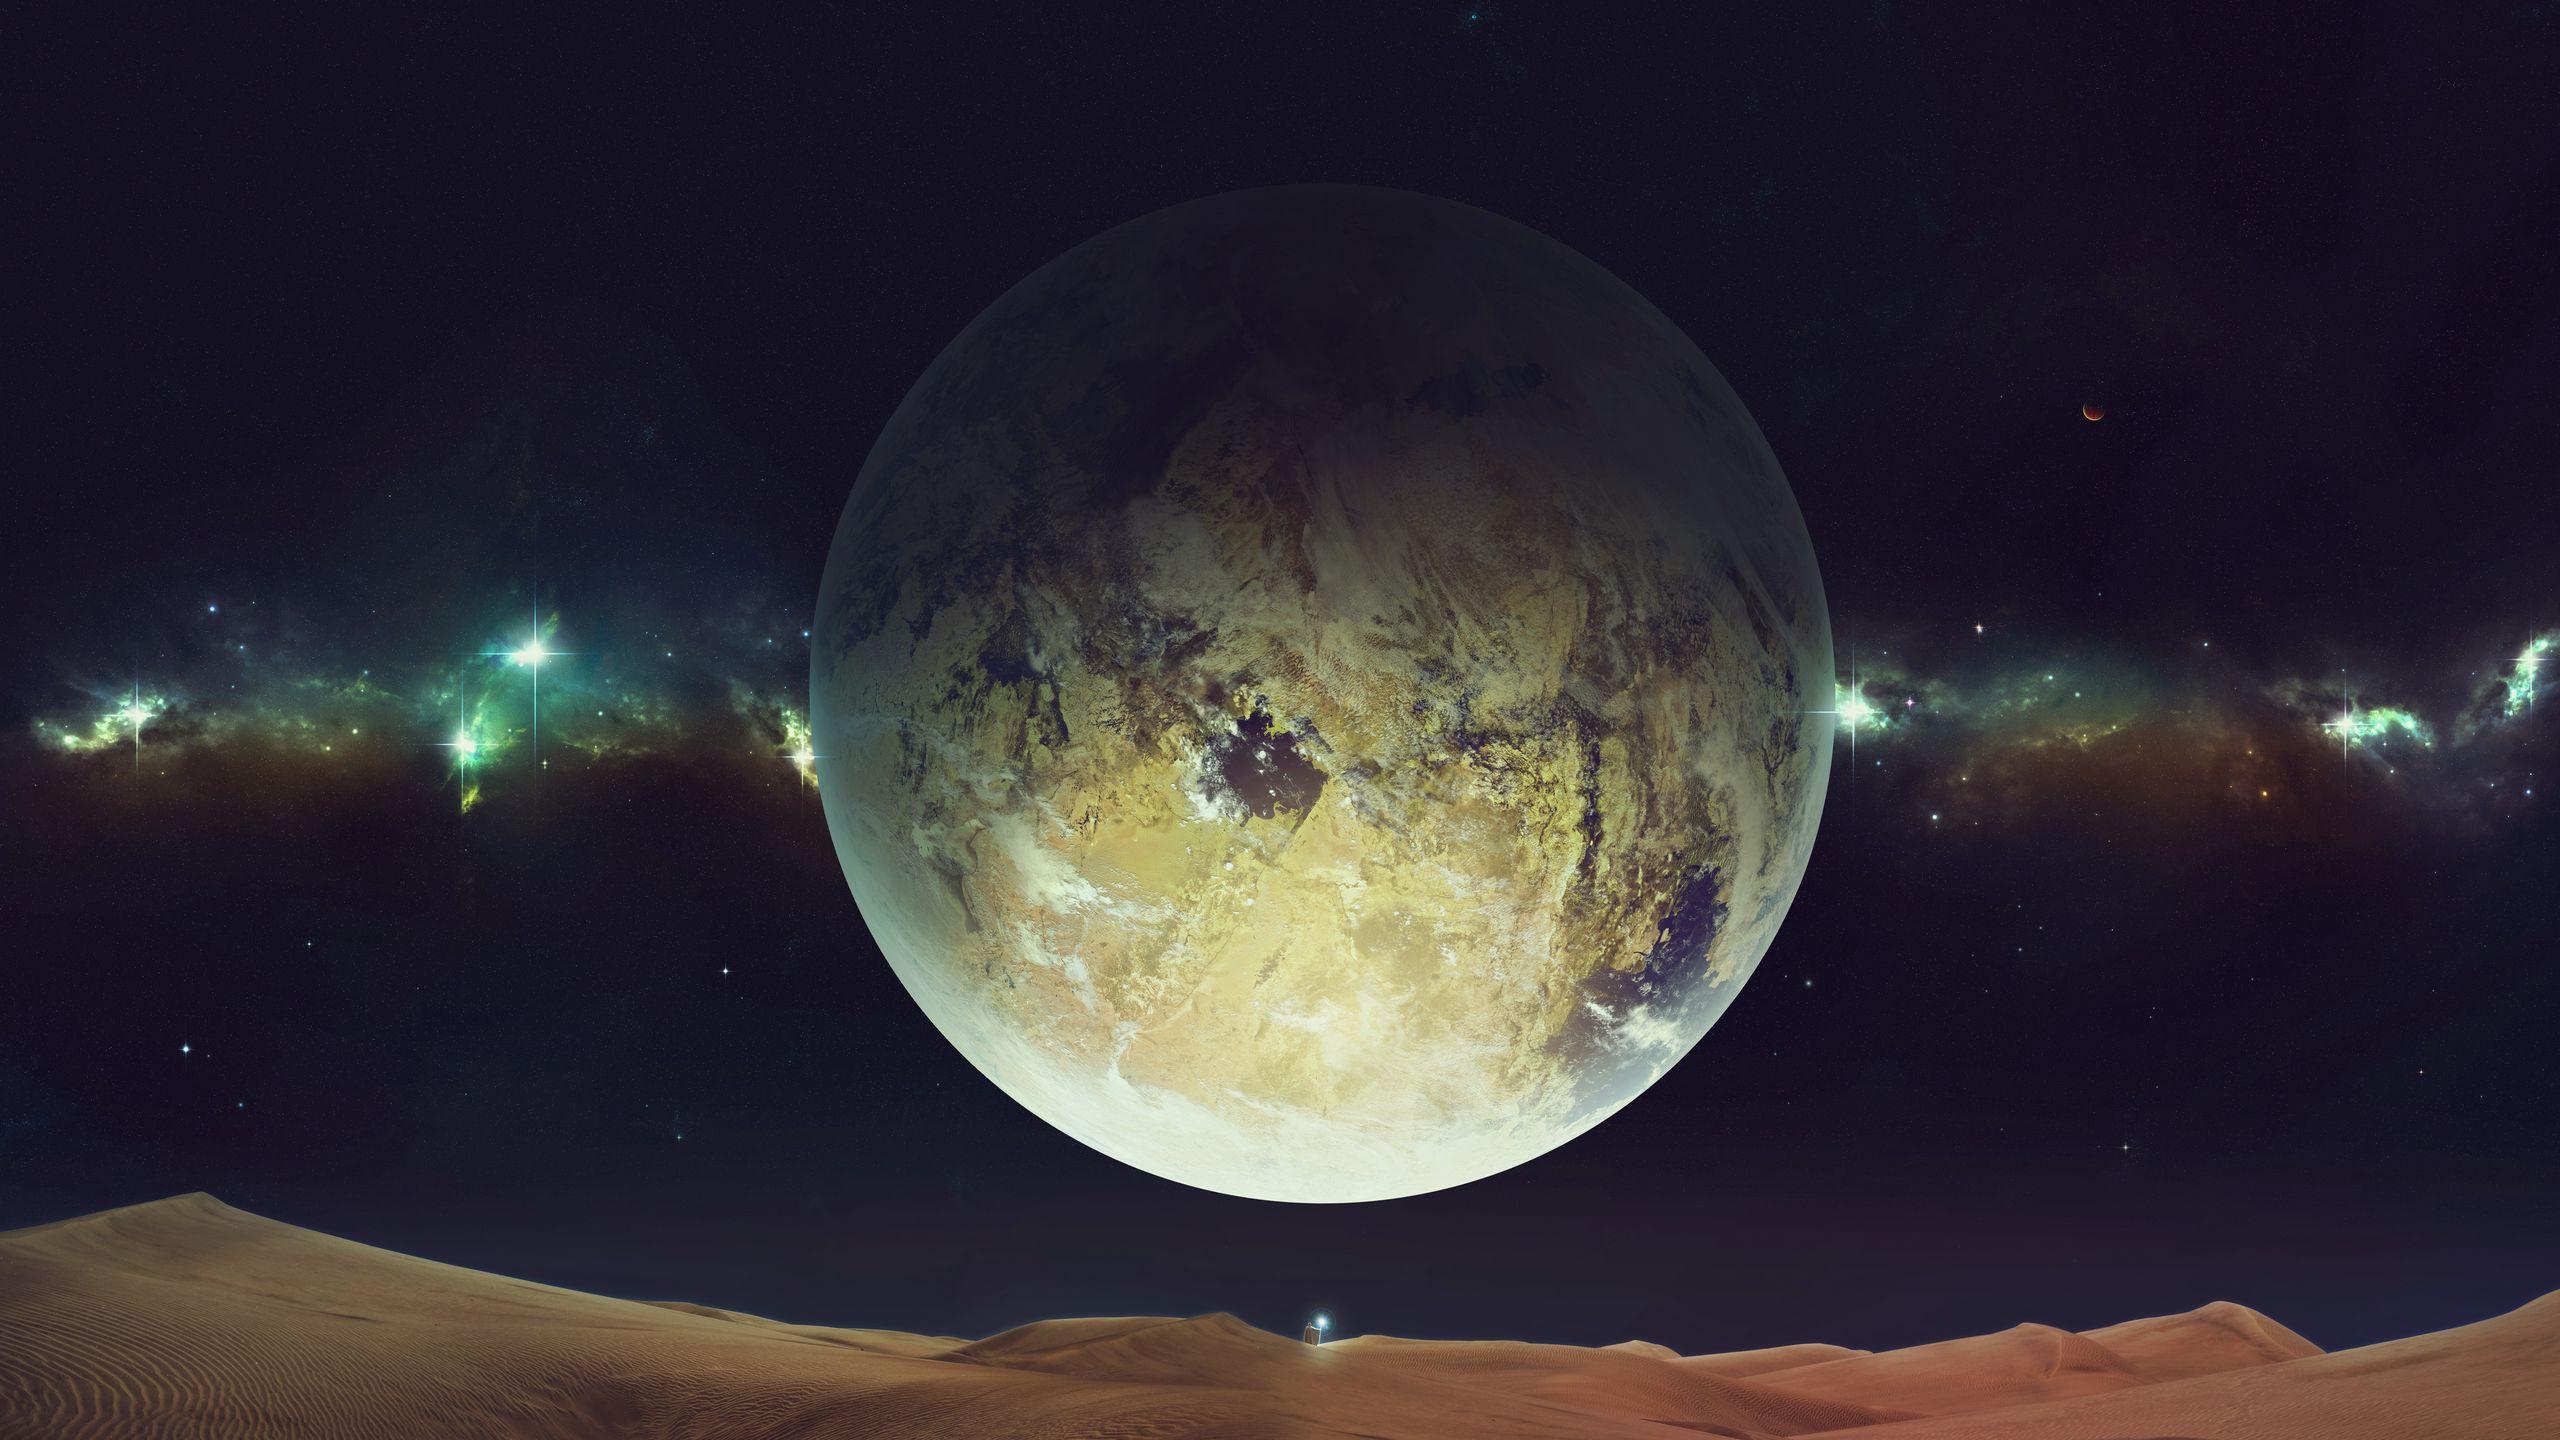 2560x1440 Wallpaper space, planet, sky